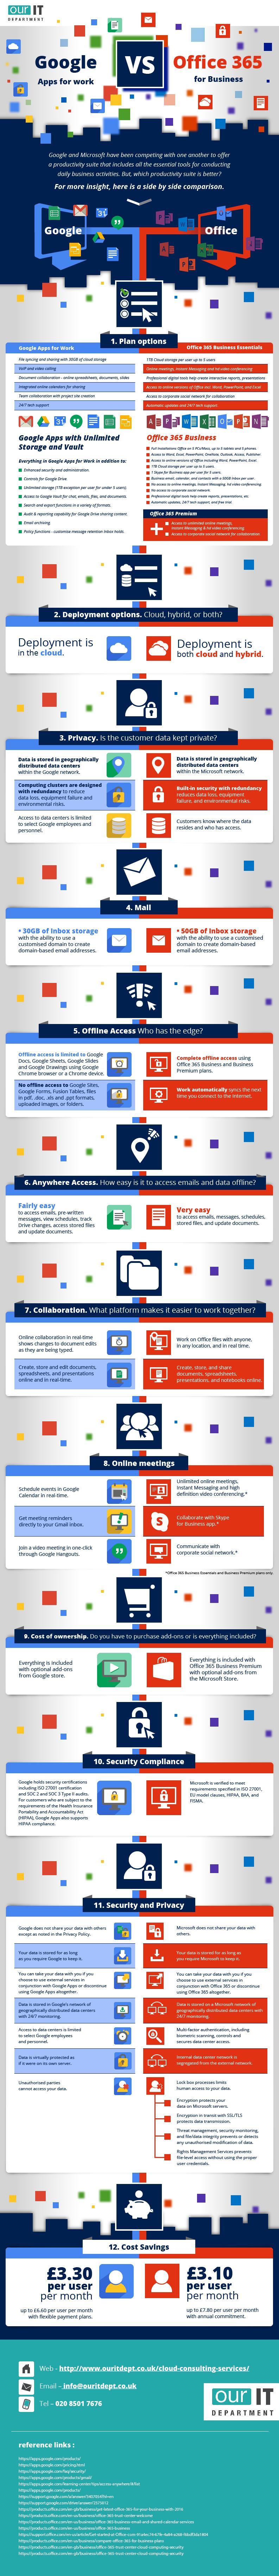 Office 365 for business vs Google Apps for Works